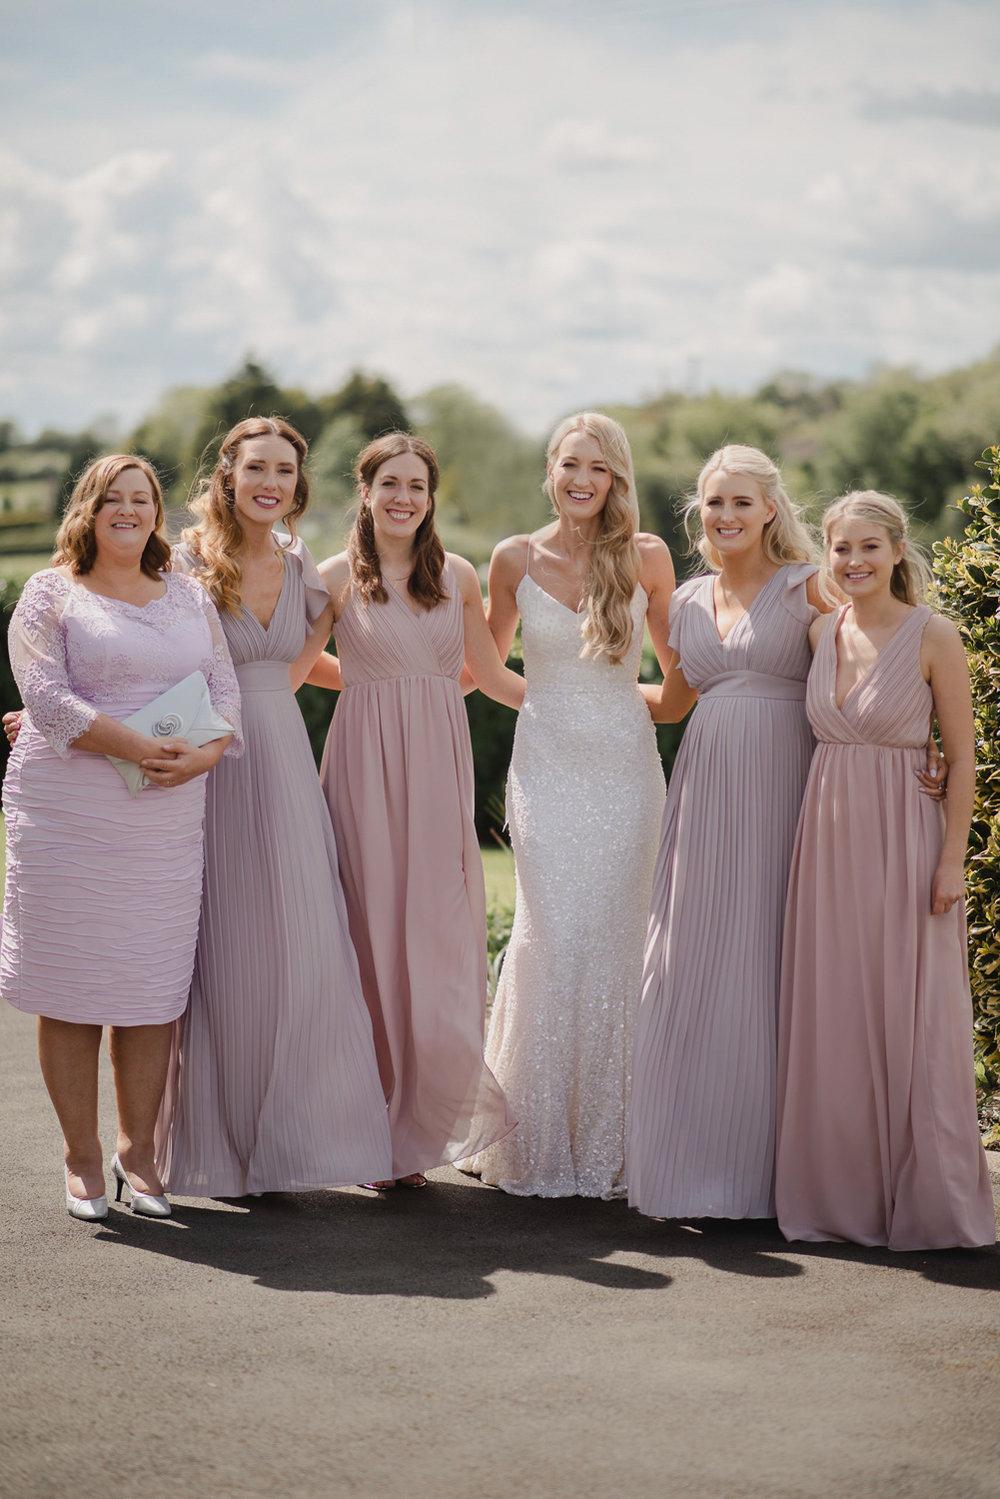 Tullyveery House wedding photography -14.jpg